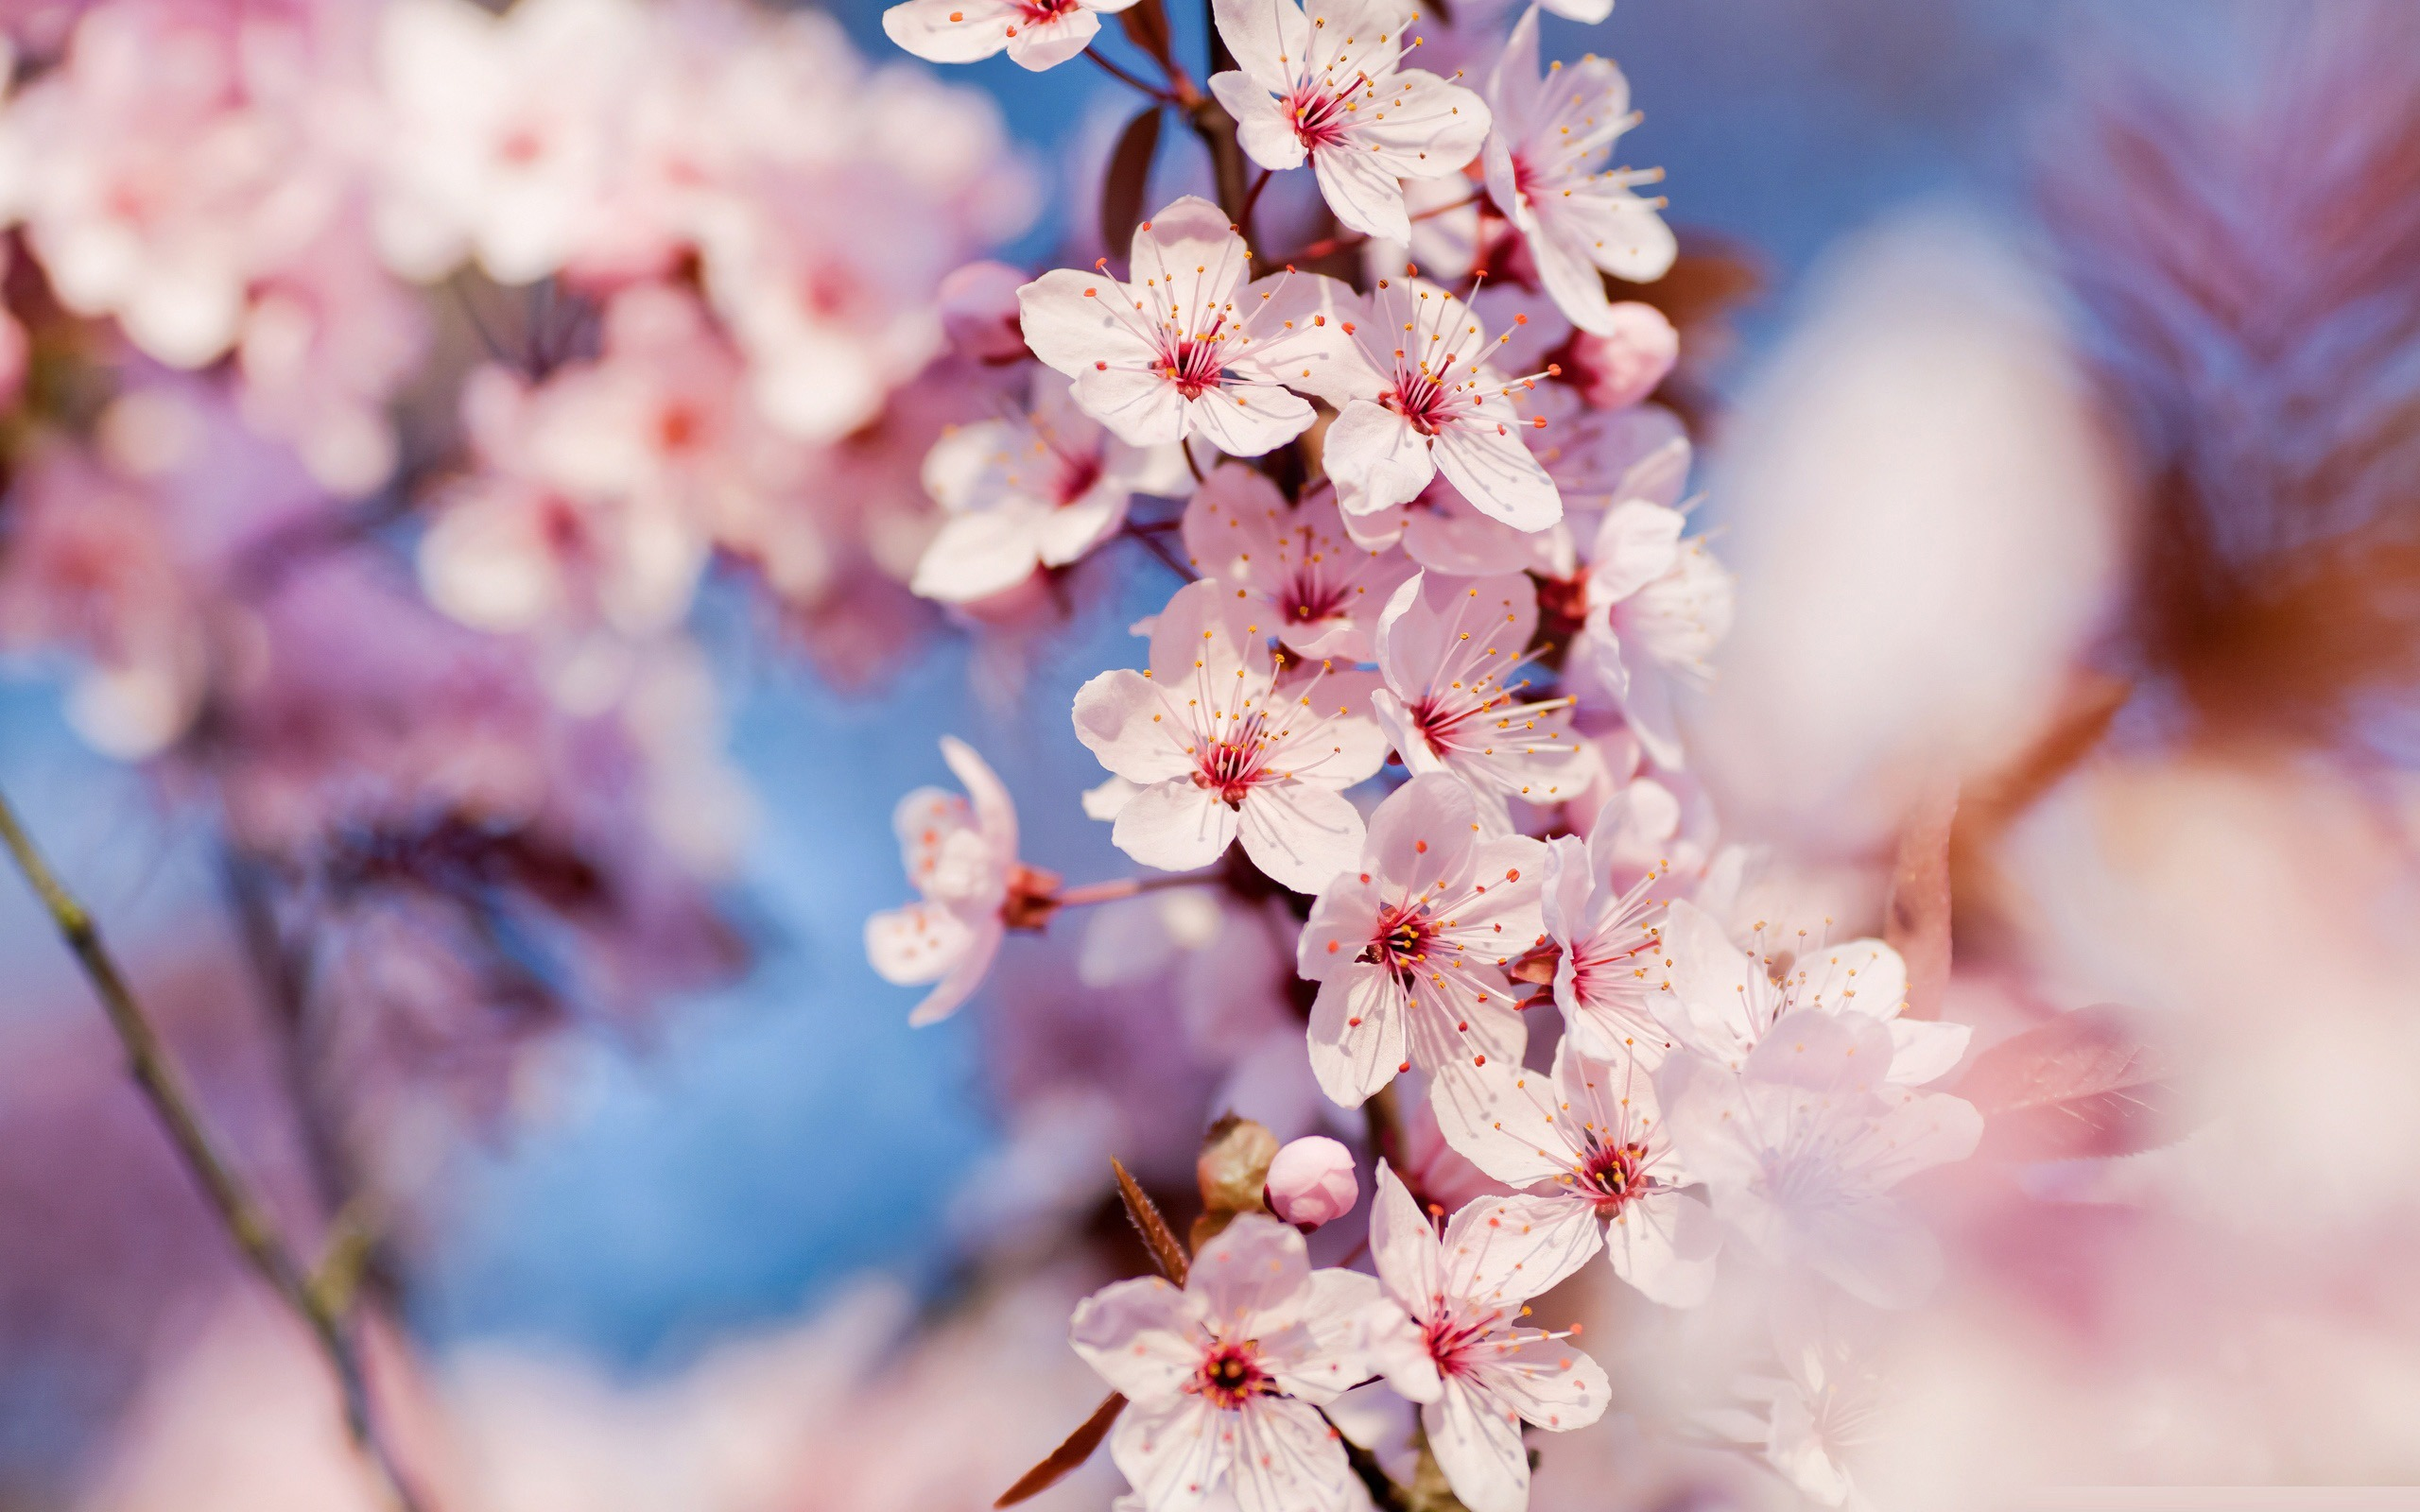 Autumn Blossom Mobile Wallpaper - Mobiles Wall